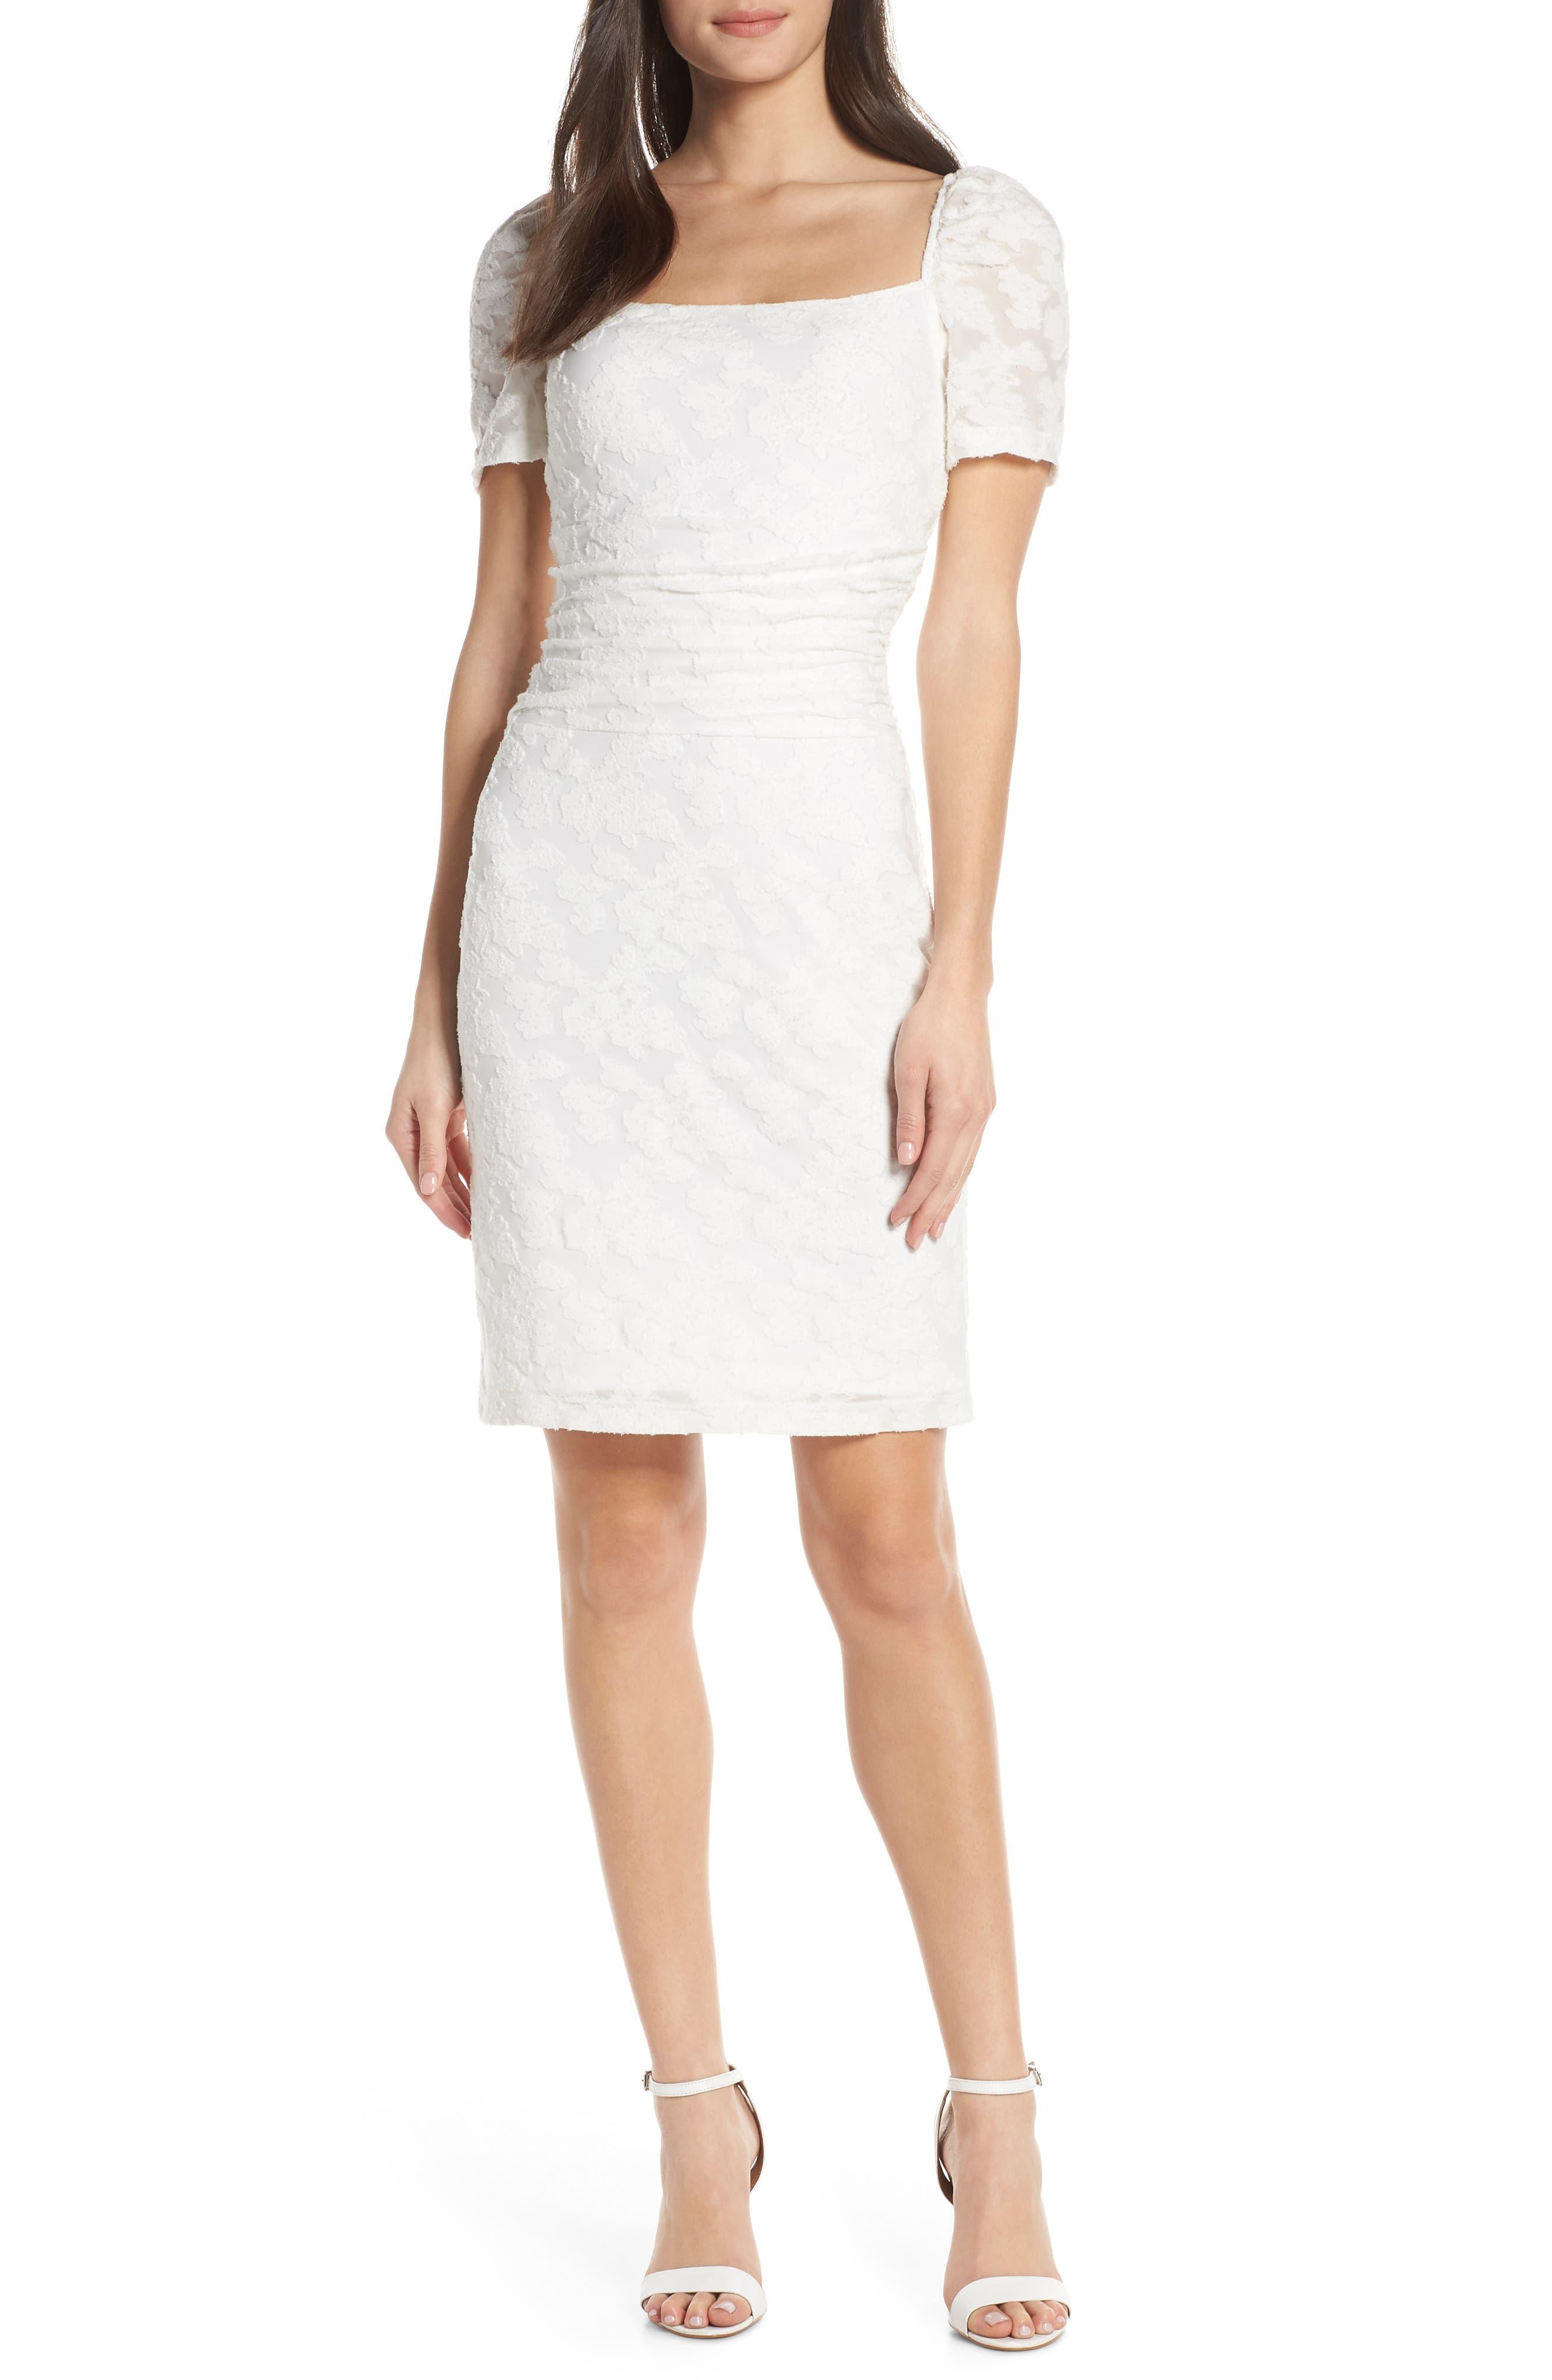 ALI & JAY, Big Mistake Short Sleeve Sheath Dress, Main thumbnail 1, color, WHITE FLORAL